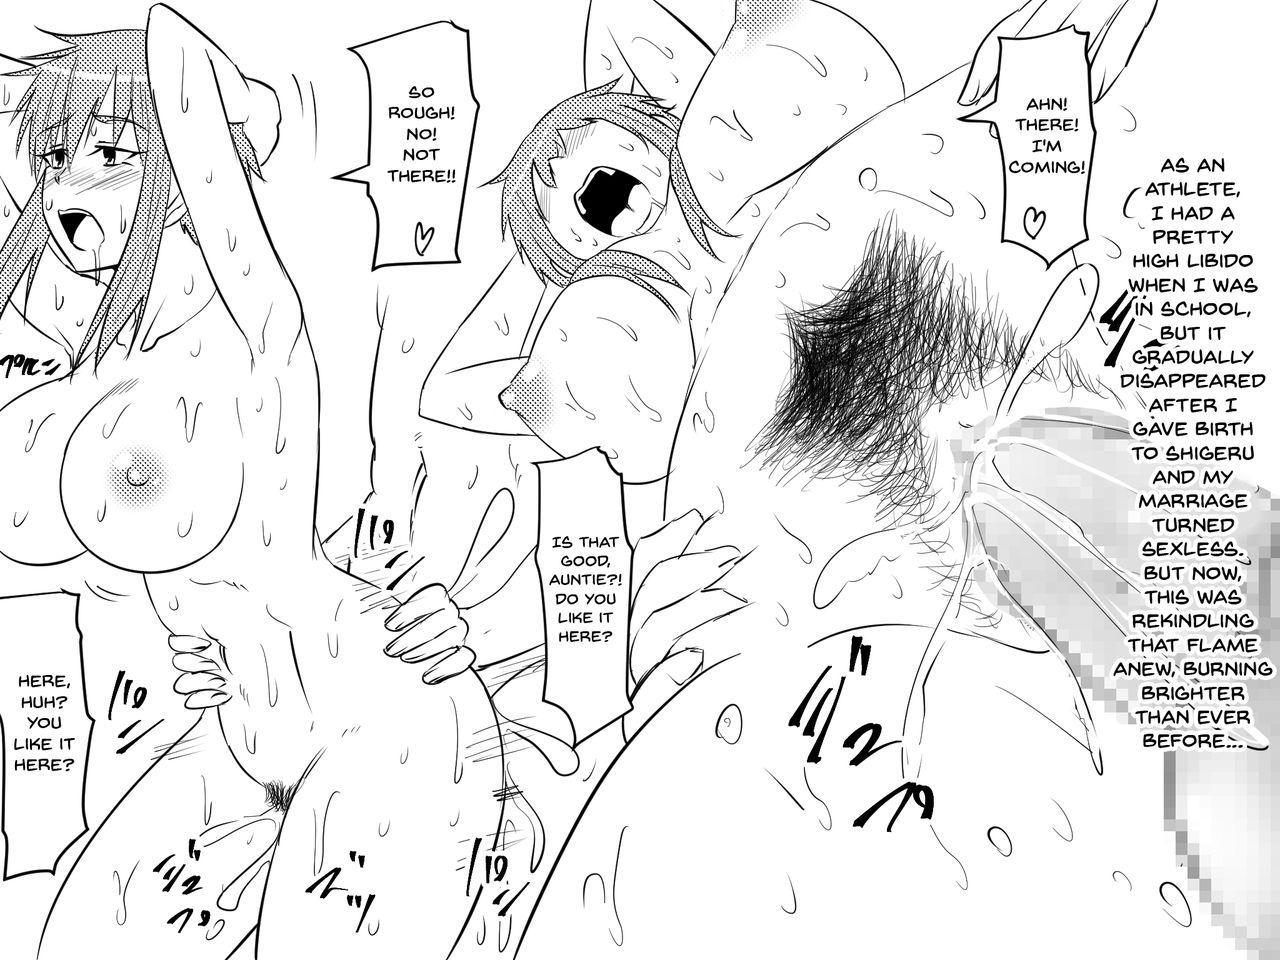 [Mikezoutei] Netorare Haha ~Kachiki de Kimottama no Okaa-san ga Boku o Ijimeru Aitsu no Onna ni Naru Hanashi~   Mom NTR ~A Story Of How My Gutsy Mom Ended Up Becoming My Bully's Plaything~ [English] {Doujins.com} 53